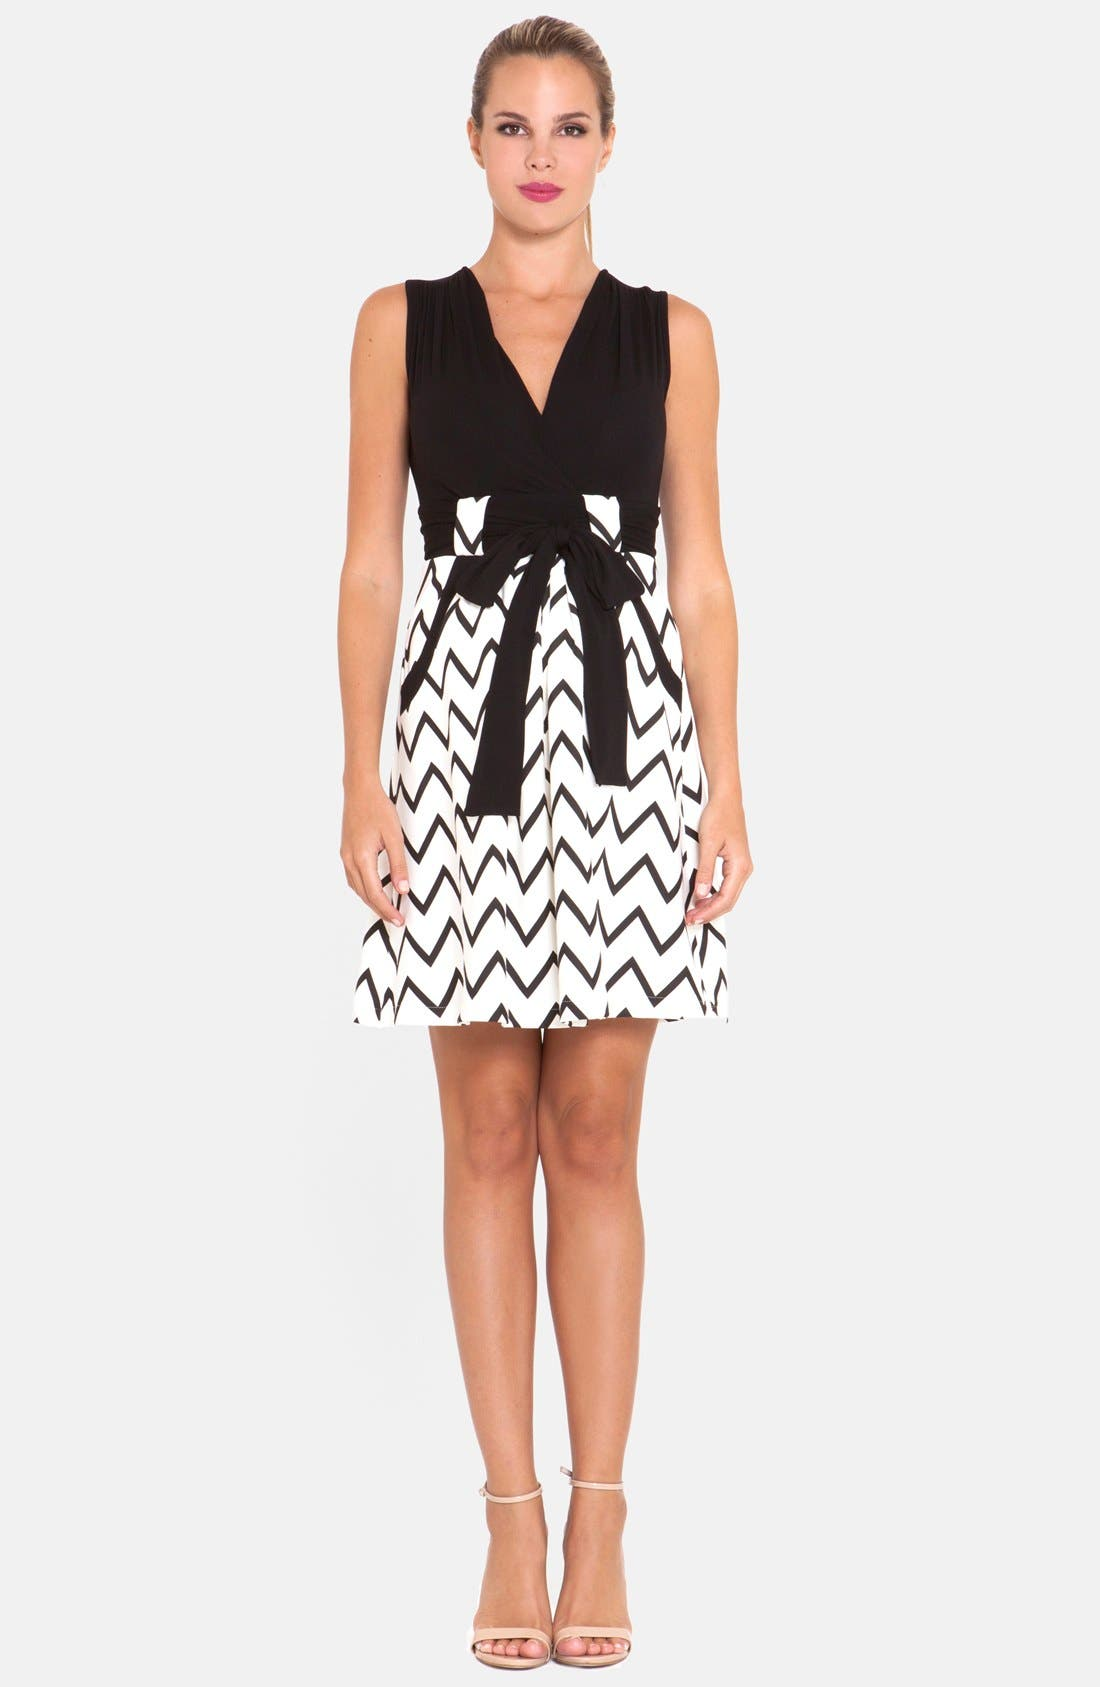 OLIAN Chevron Print Maternity Dress, Main, color, 001